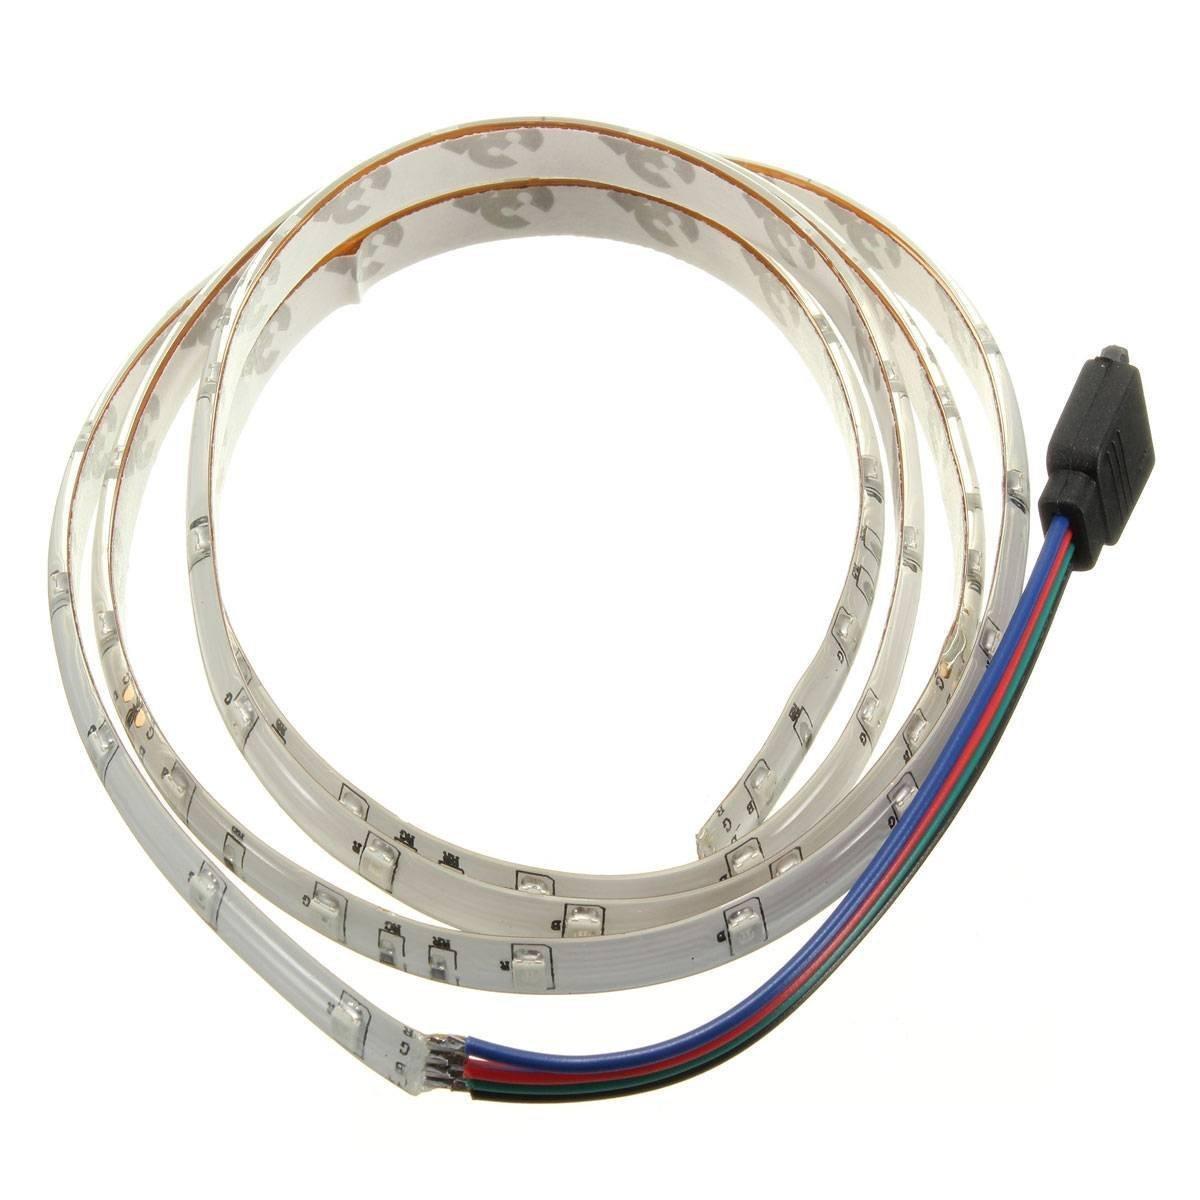 LED Strip Lumineuse - SODIAL(R)1M 60-3528 SMD RGB etanche LED Strip Lumineuse DC12V